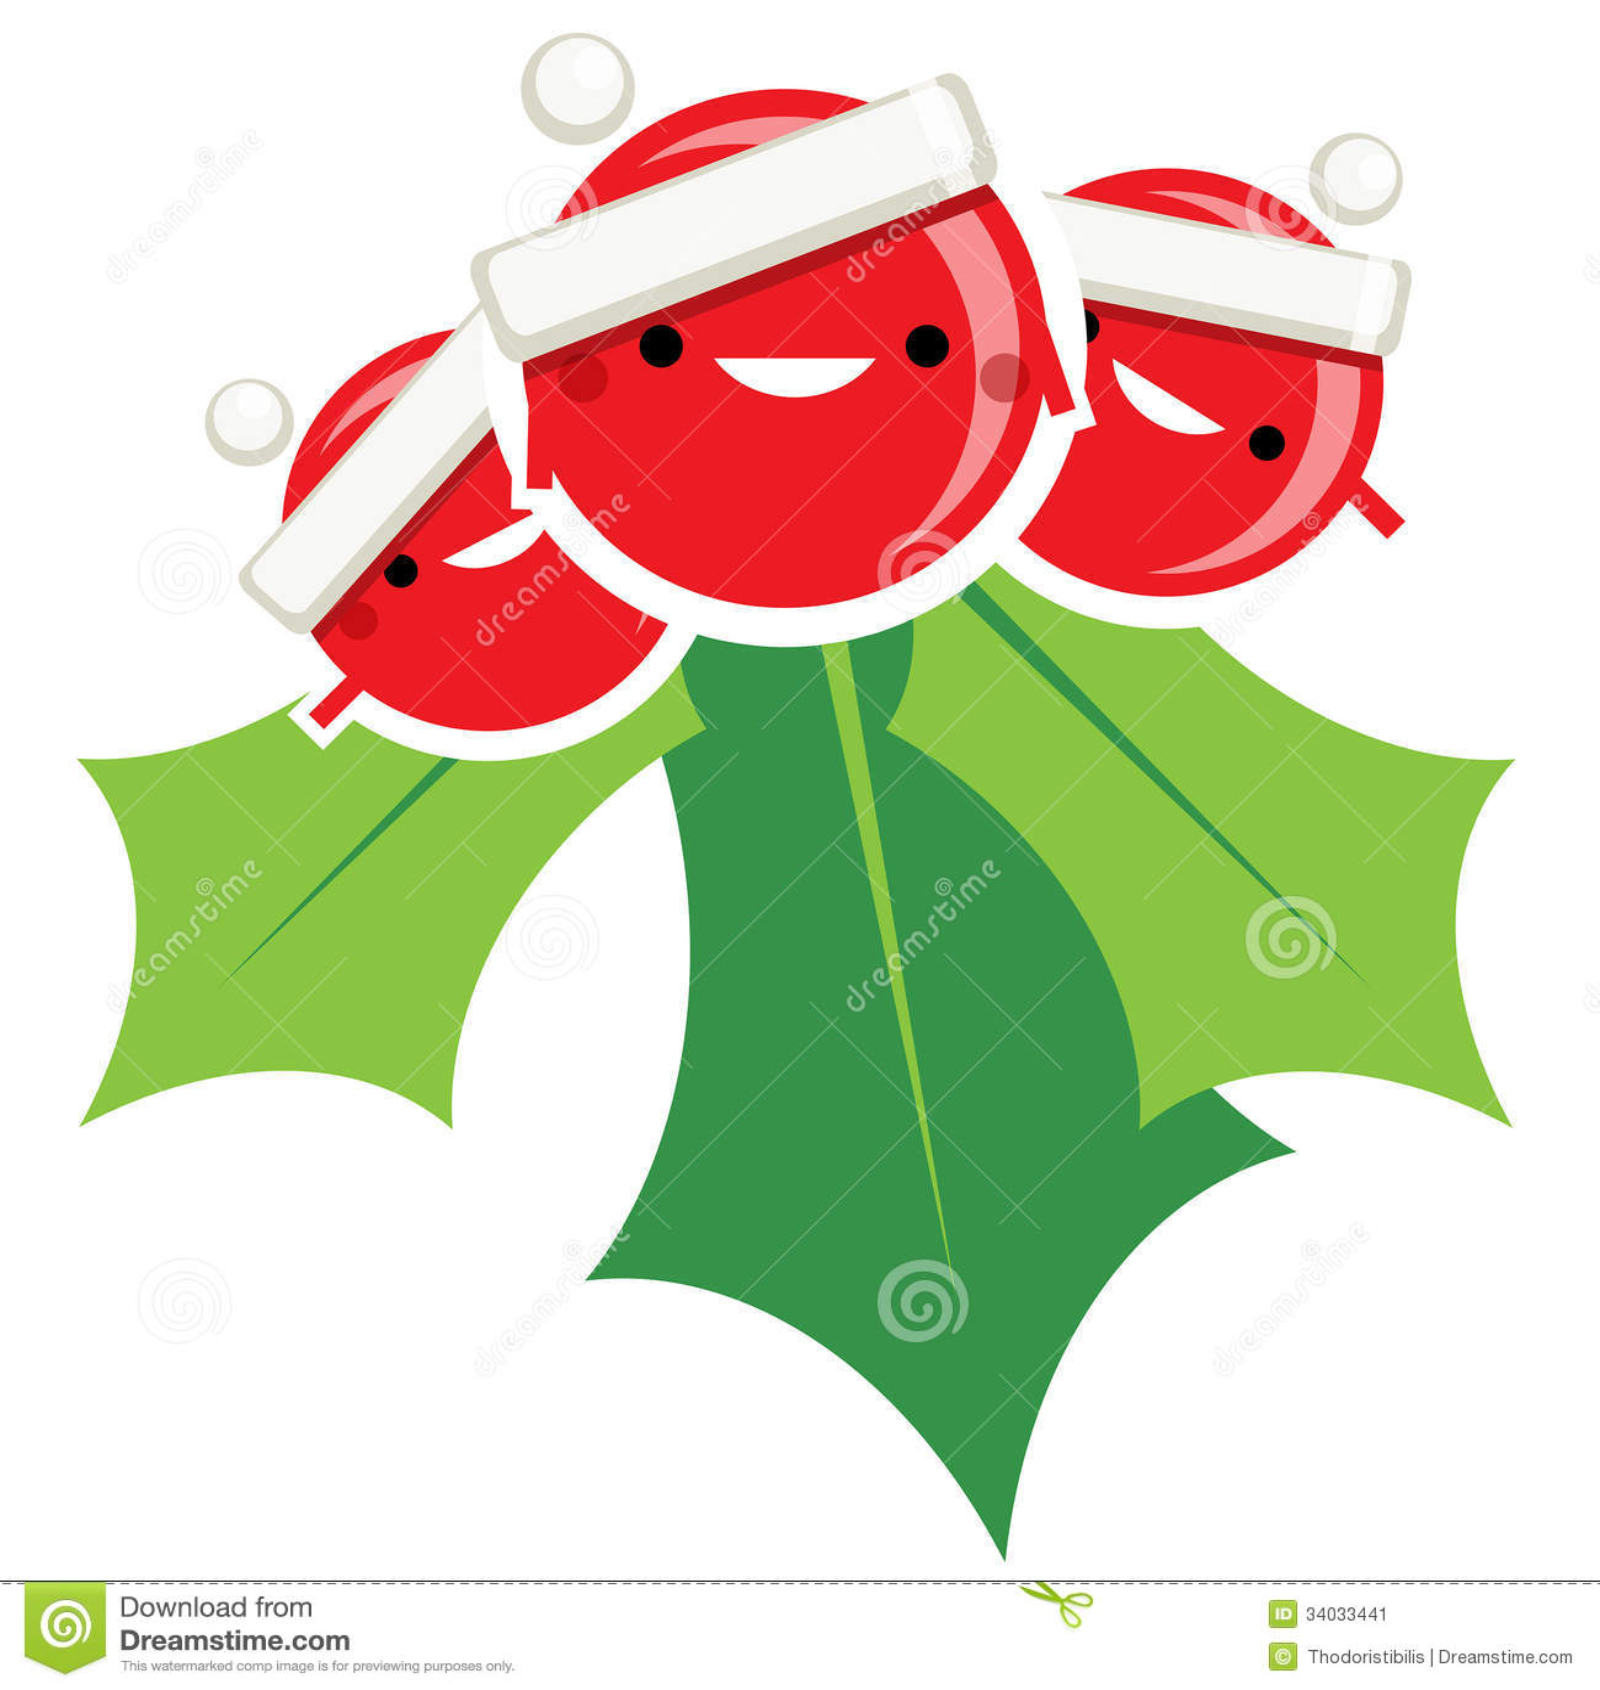 Royaltyfree Stock Photo Download Happy Simple Cartoon Smiling Christmas  Mistletoe